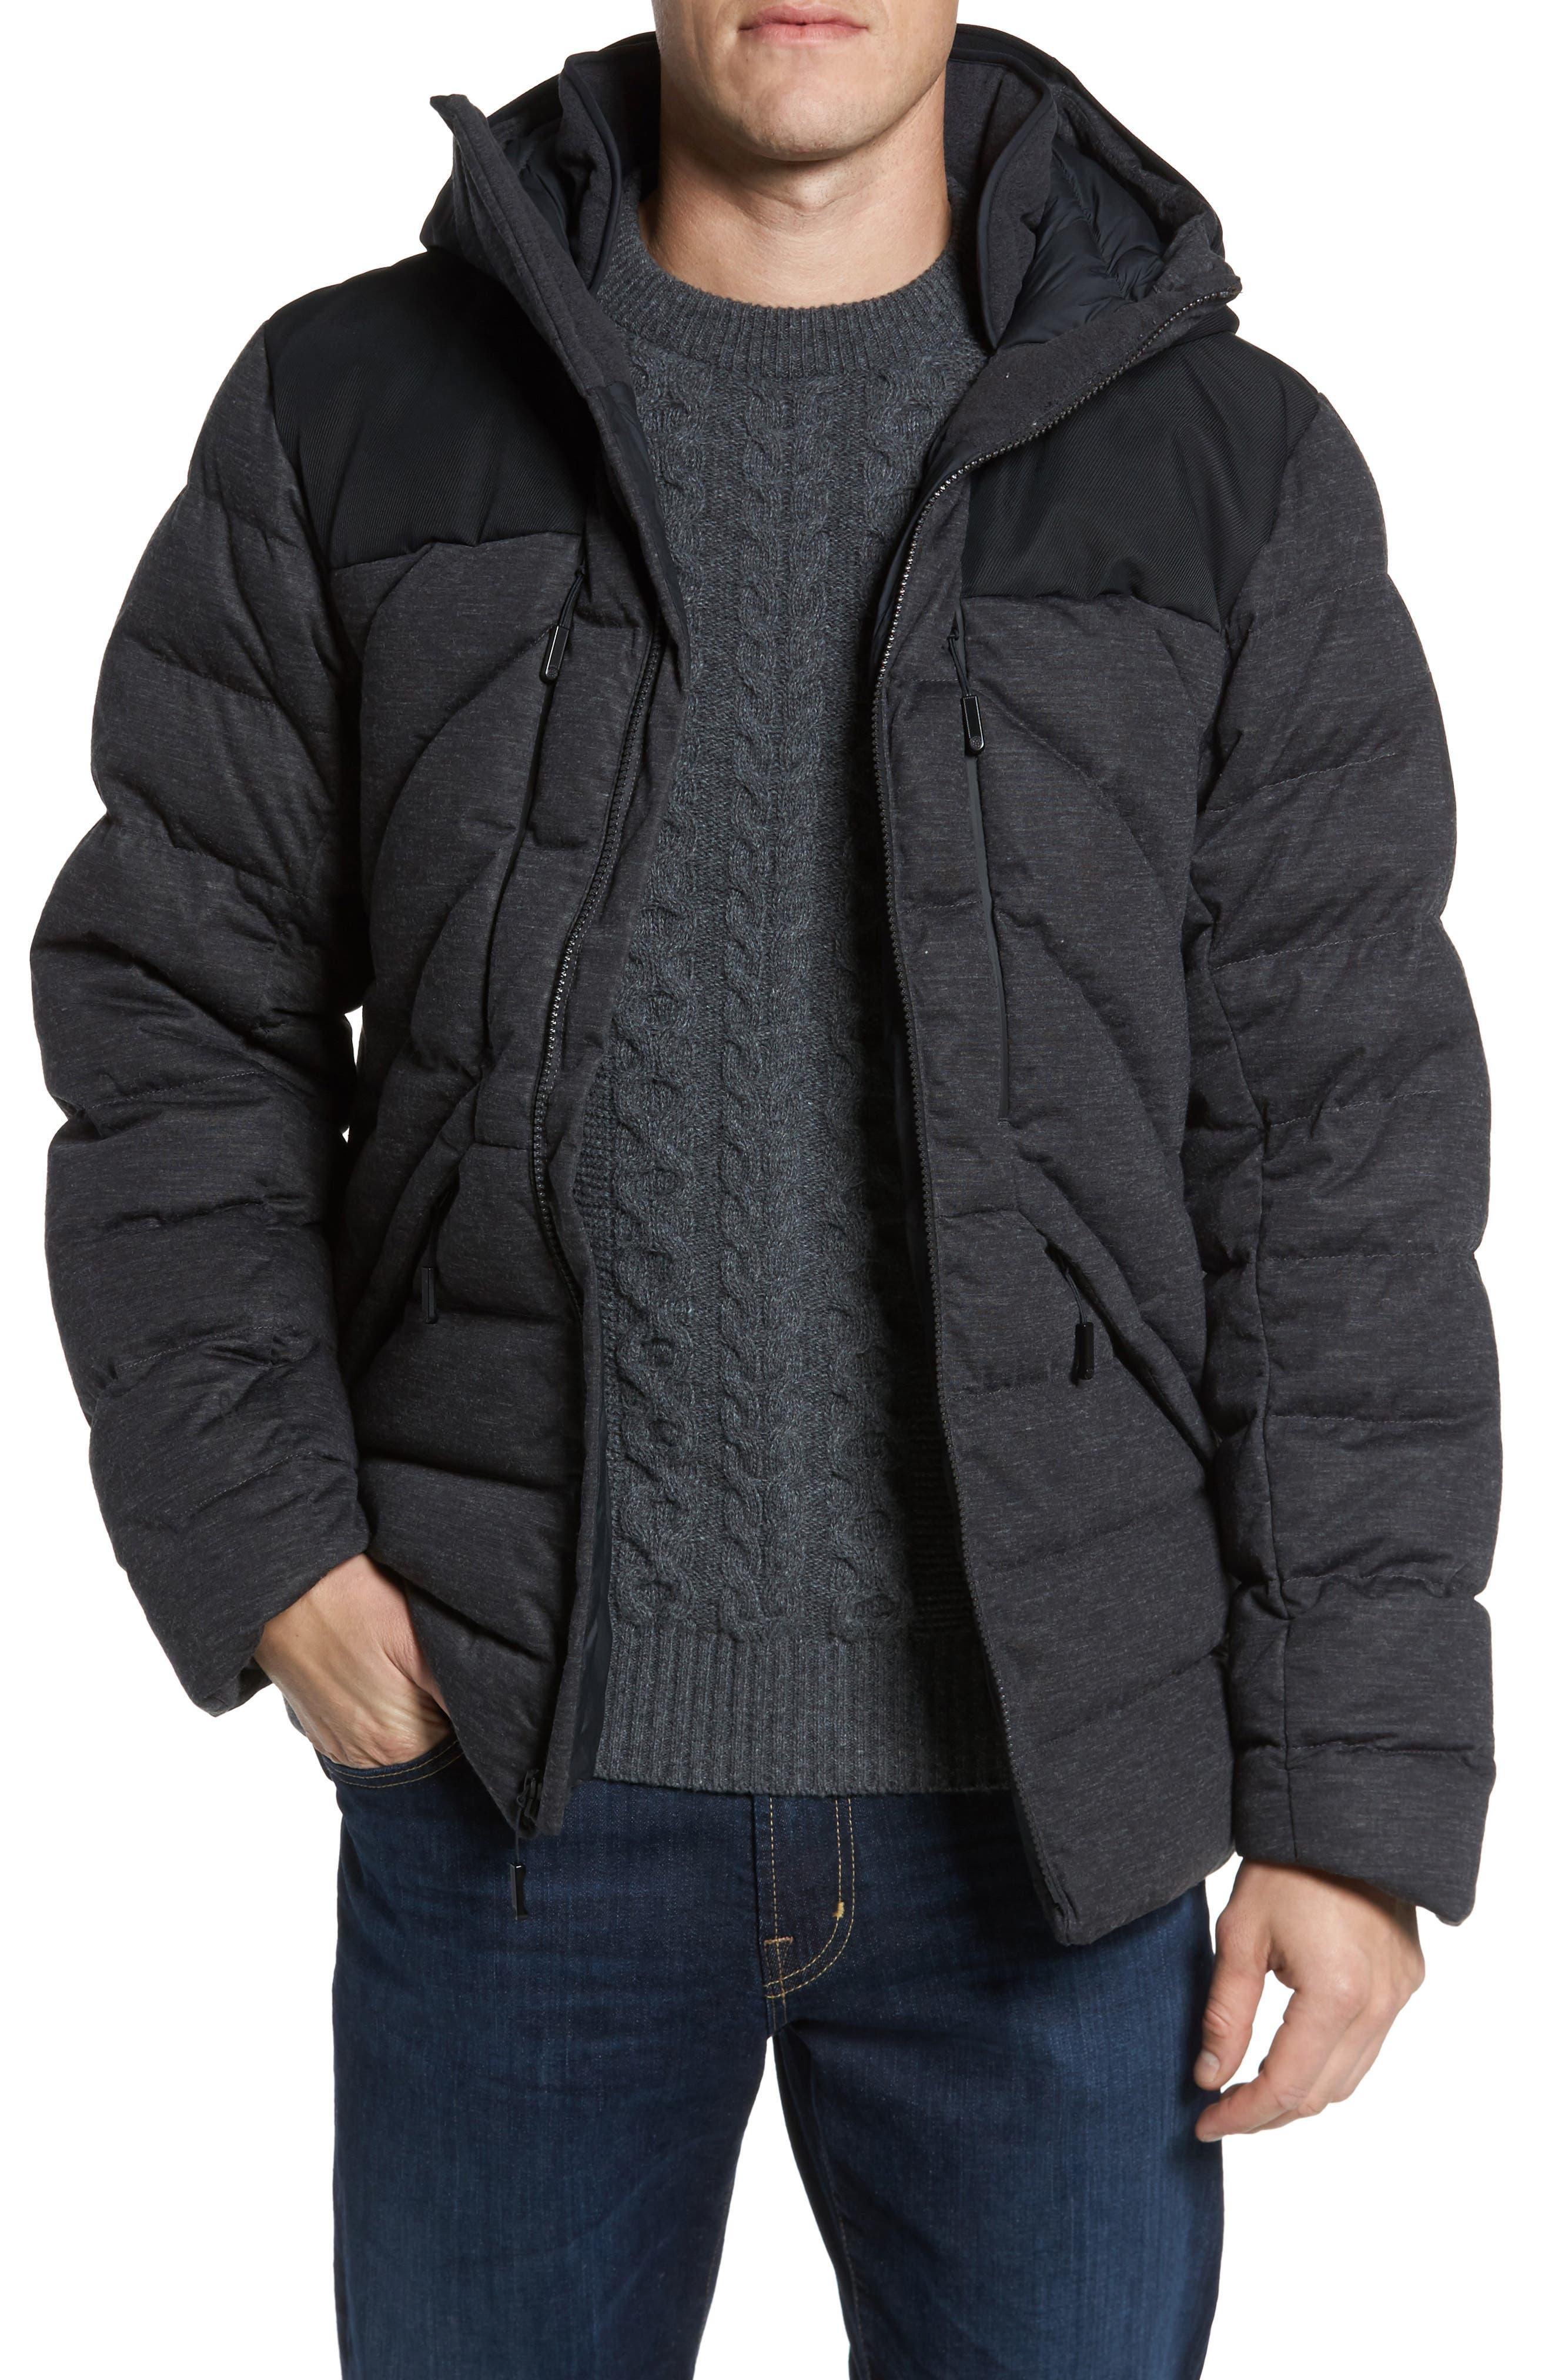 Cryos Waterproof Down Jacket,                         Main,                         color, Dark Grey Heather